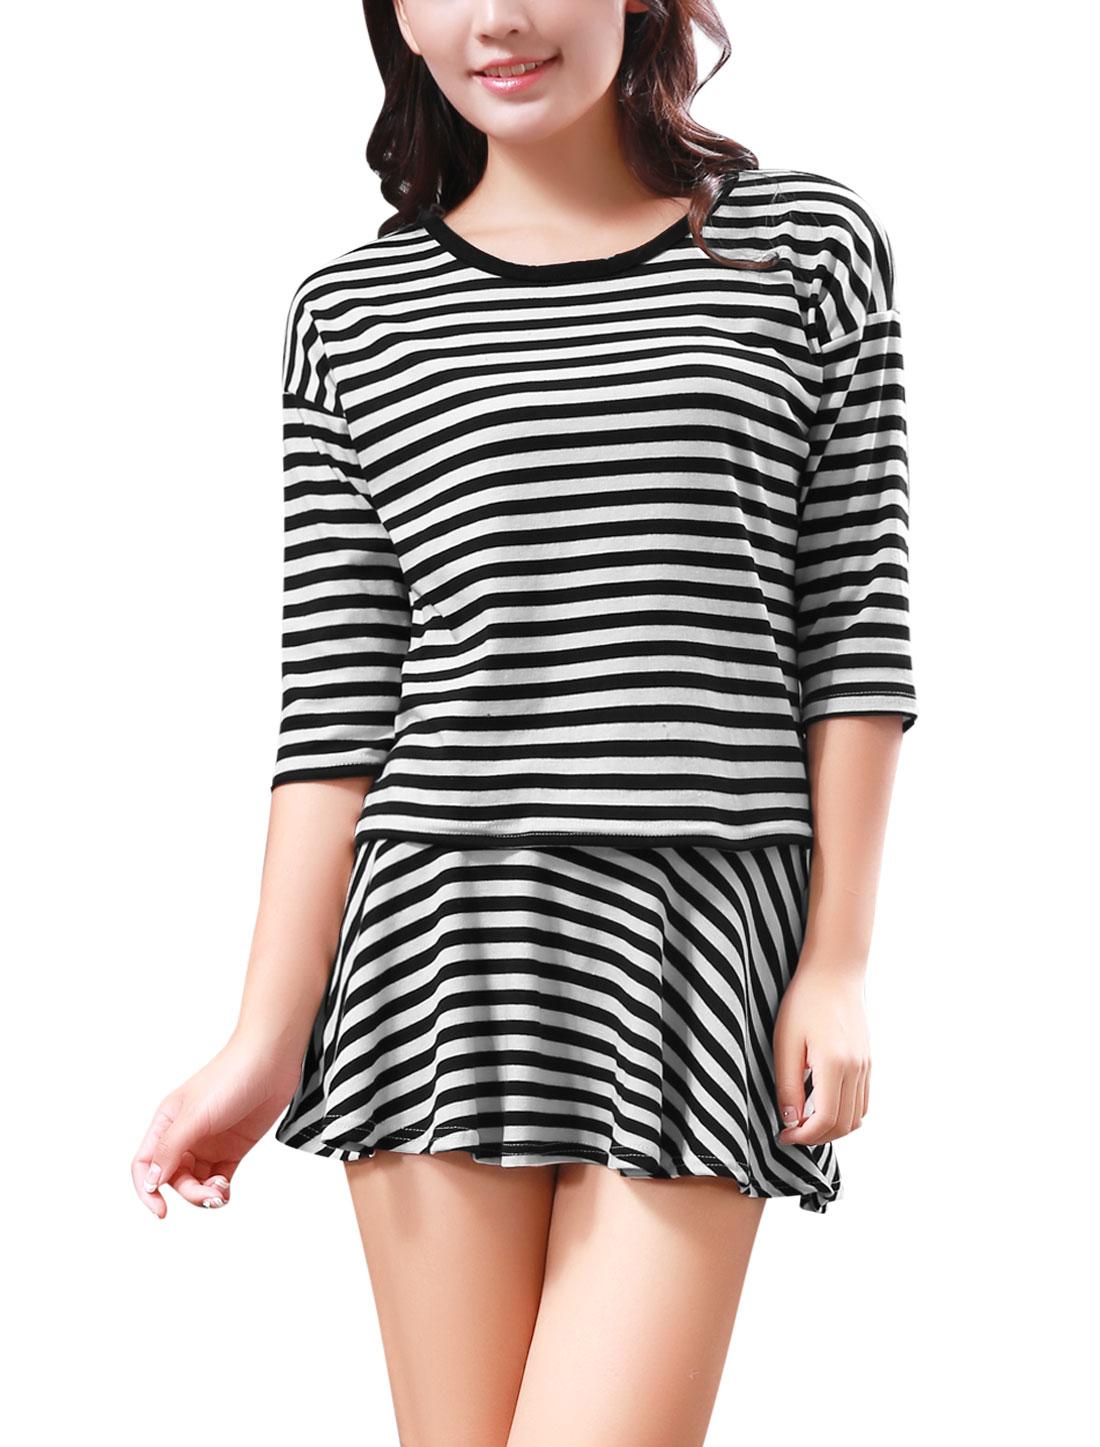 Lady Bar Striped T-Shirt w Elastic Waist Mini Skirt Black White XS